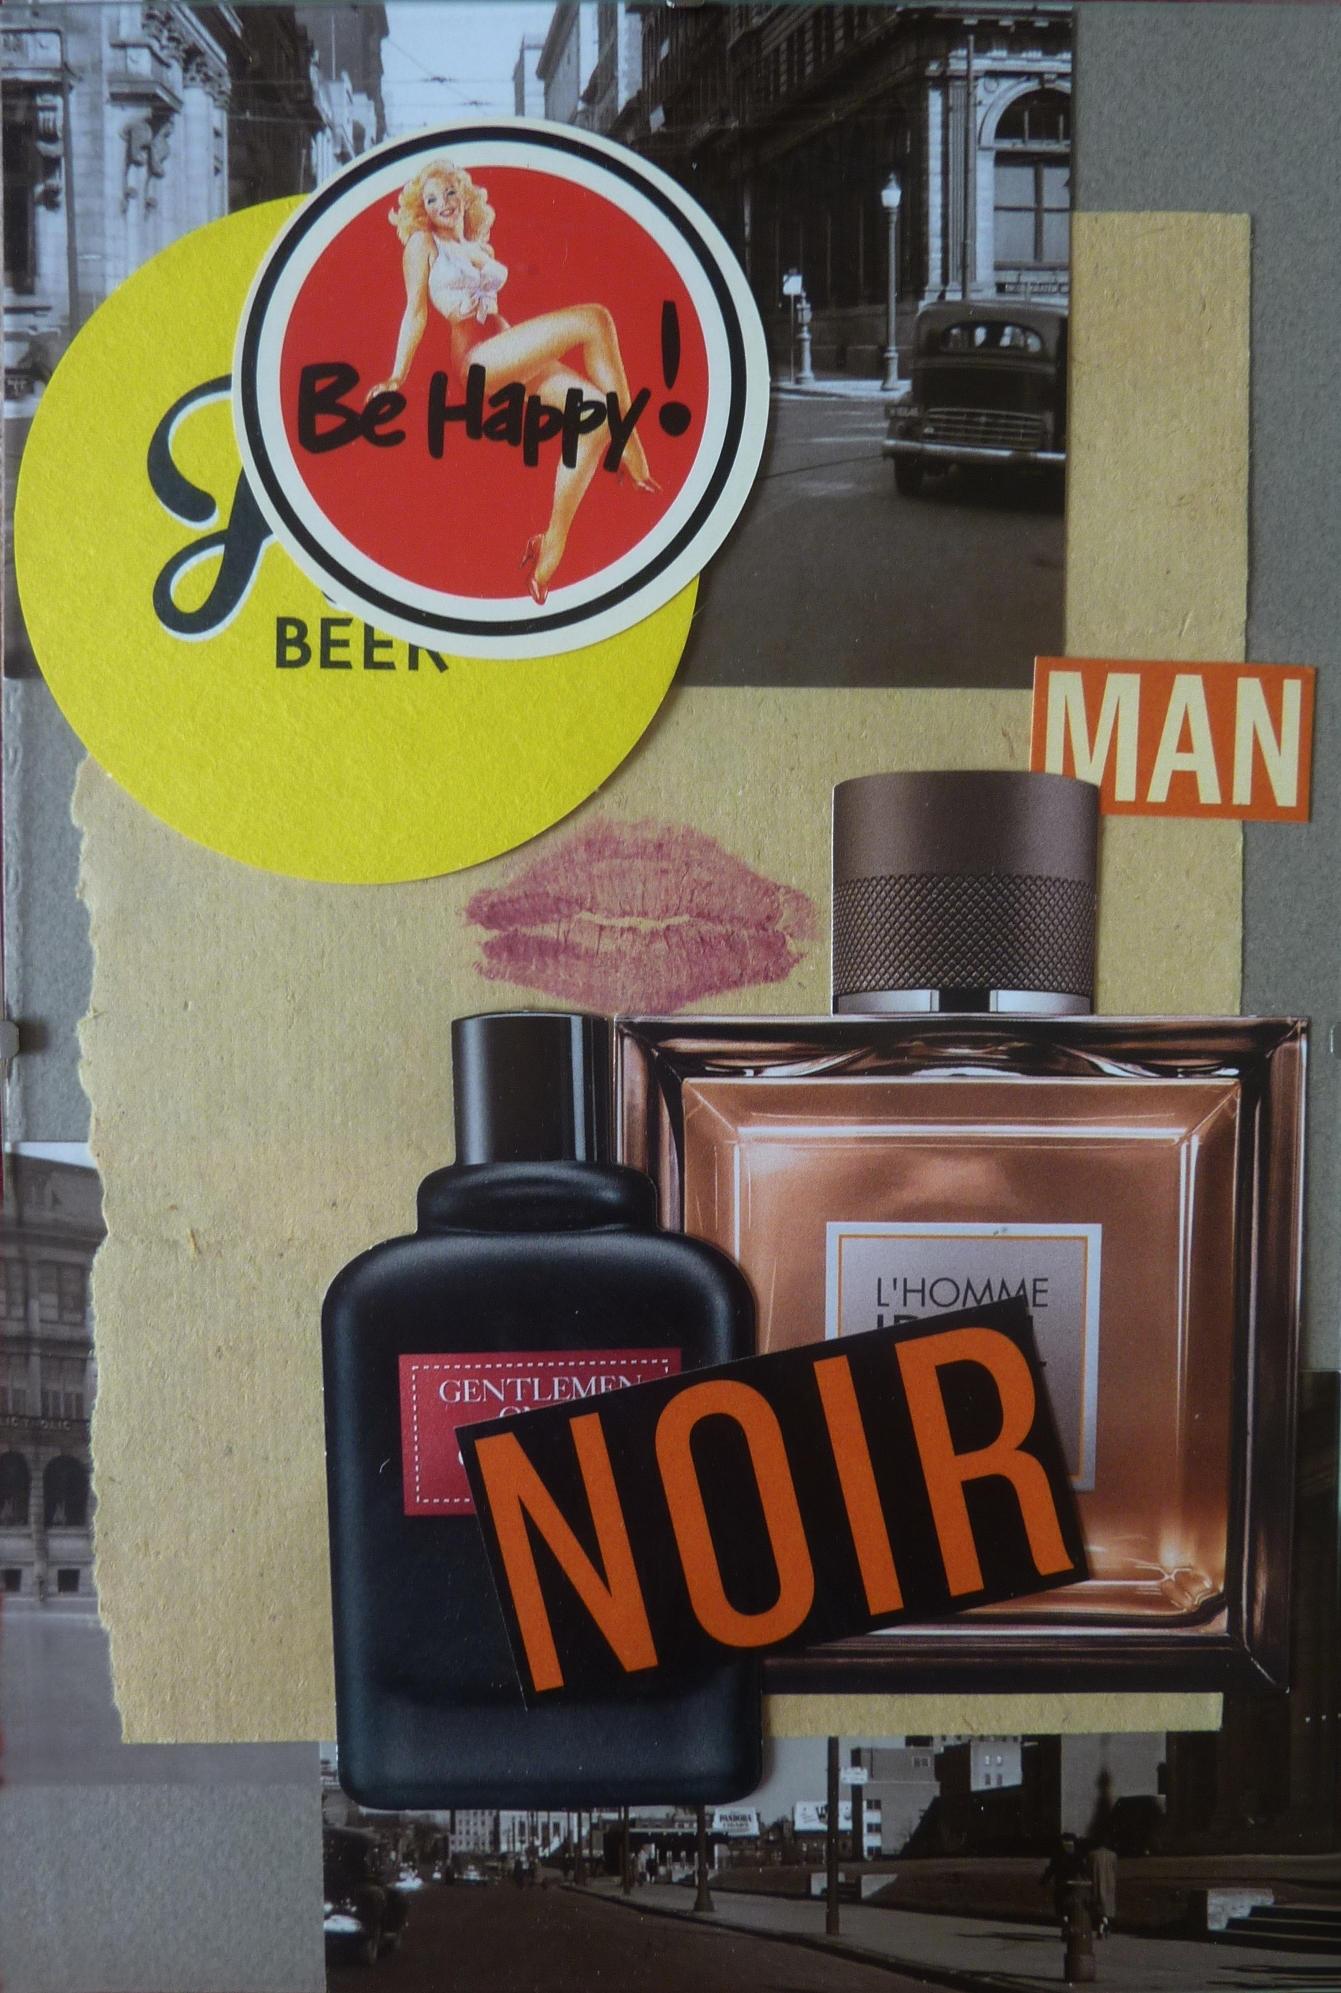 Men, glamour and Noir by stefanparis